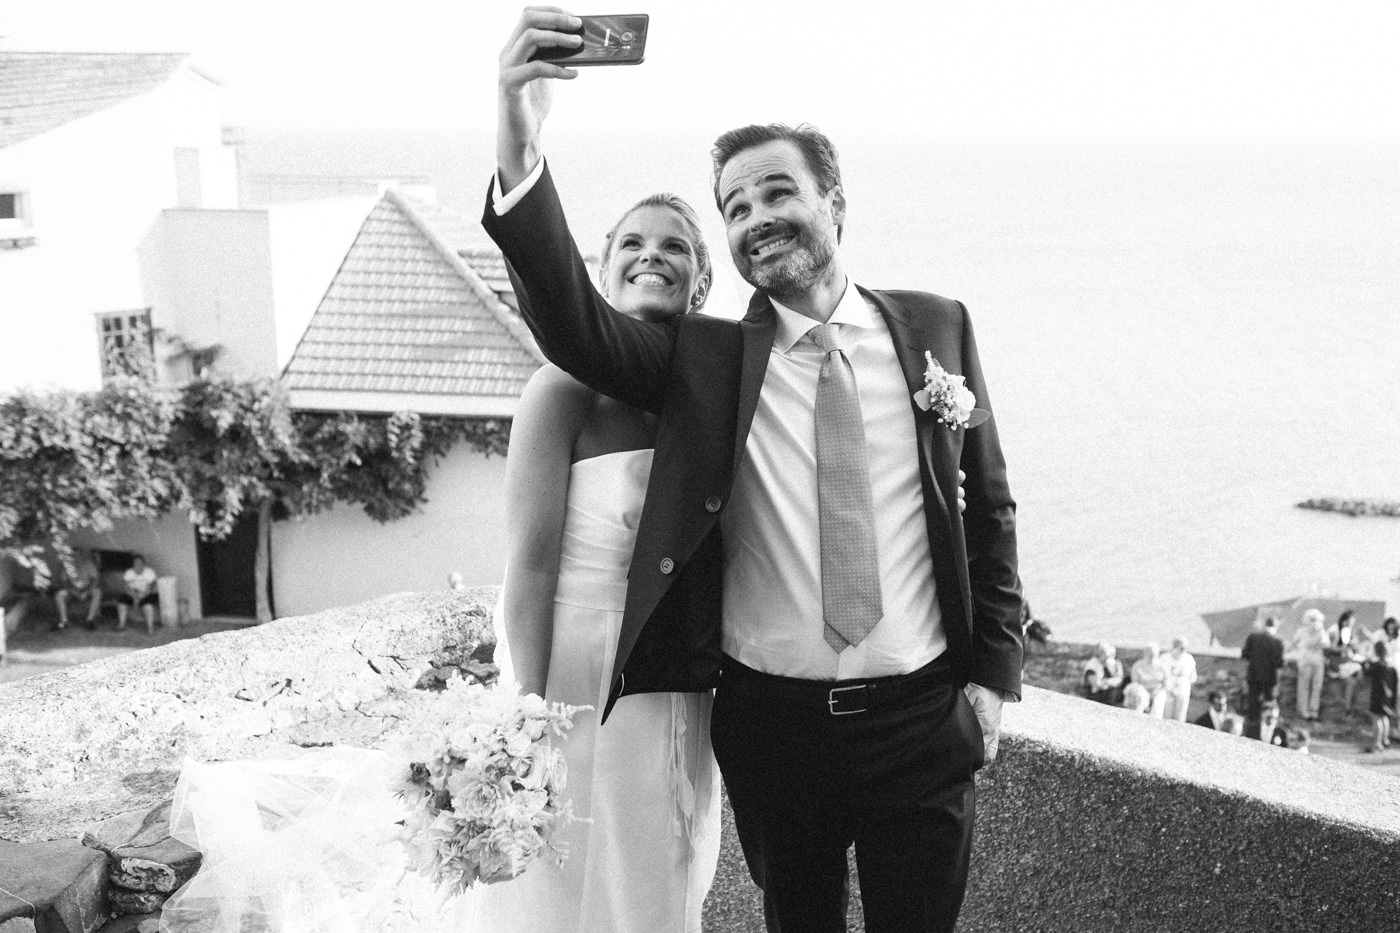 matrimoni_all_italiana_fotografo_matrimonio_cinque_terre-44.jpg